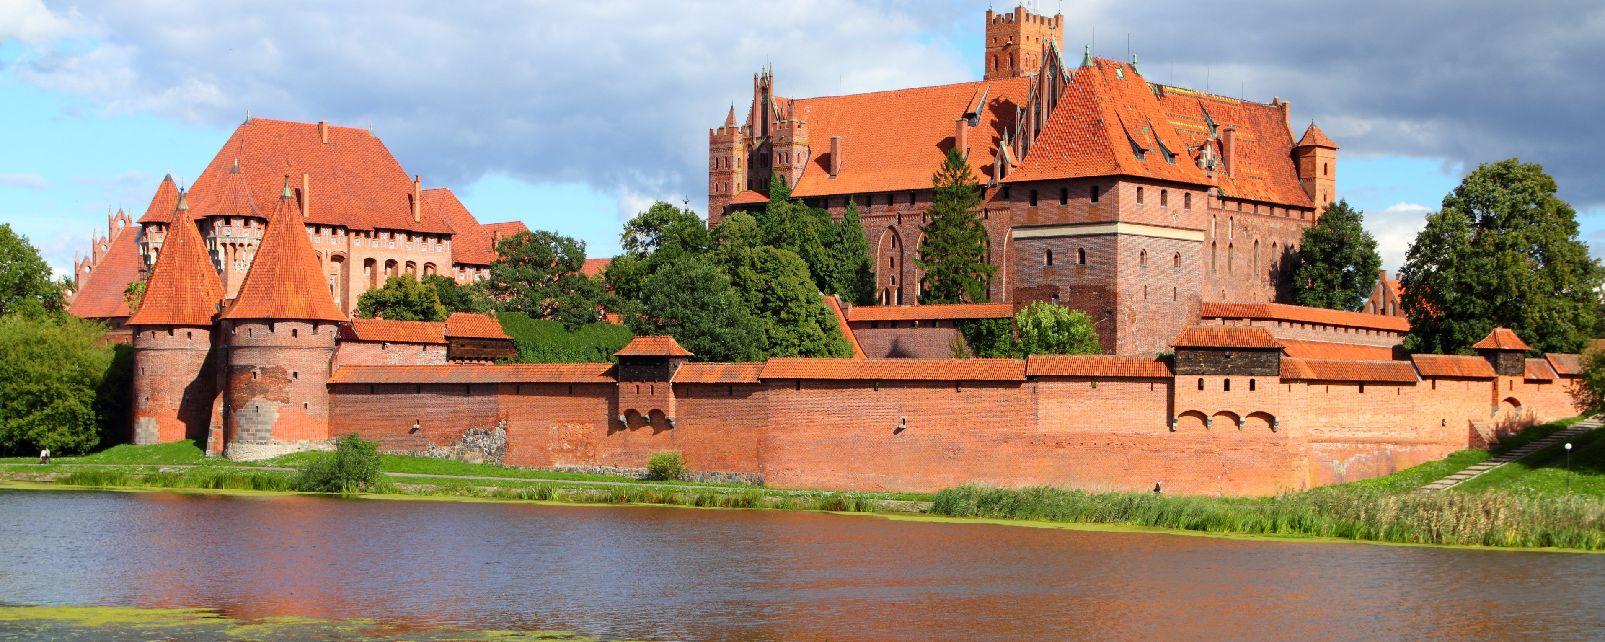 que ver en polonia en 2 dias castillo